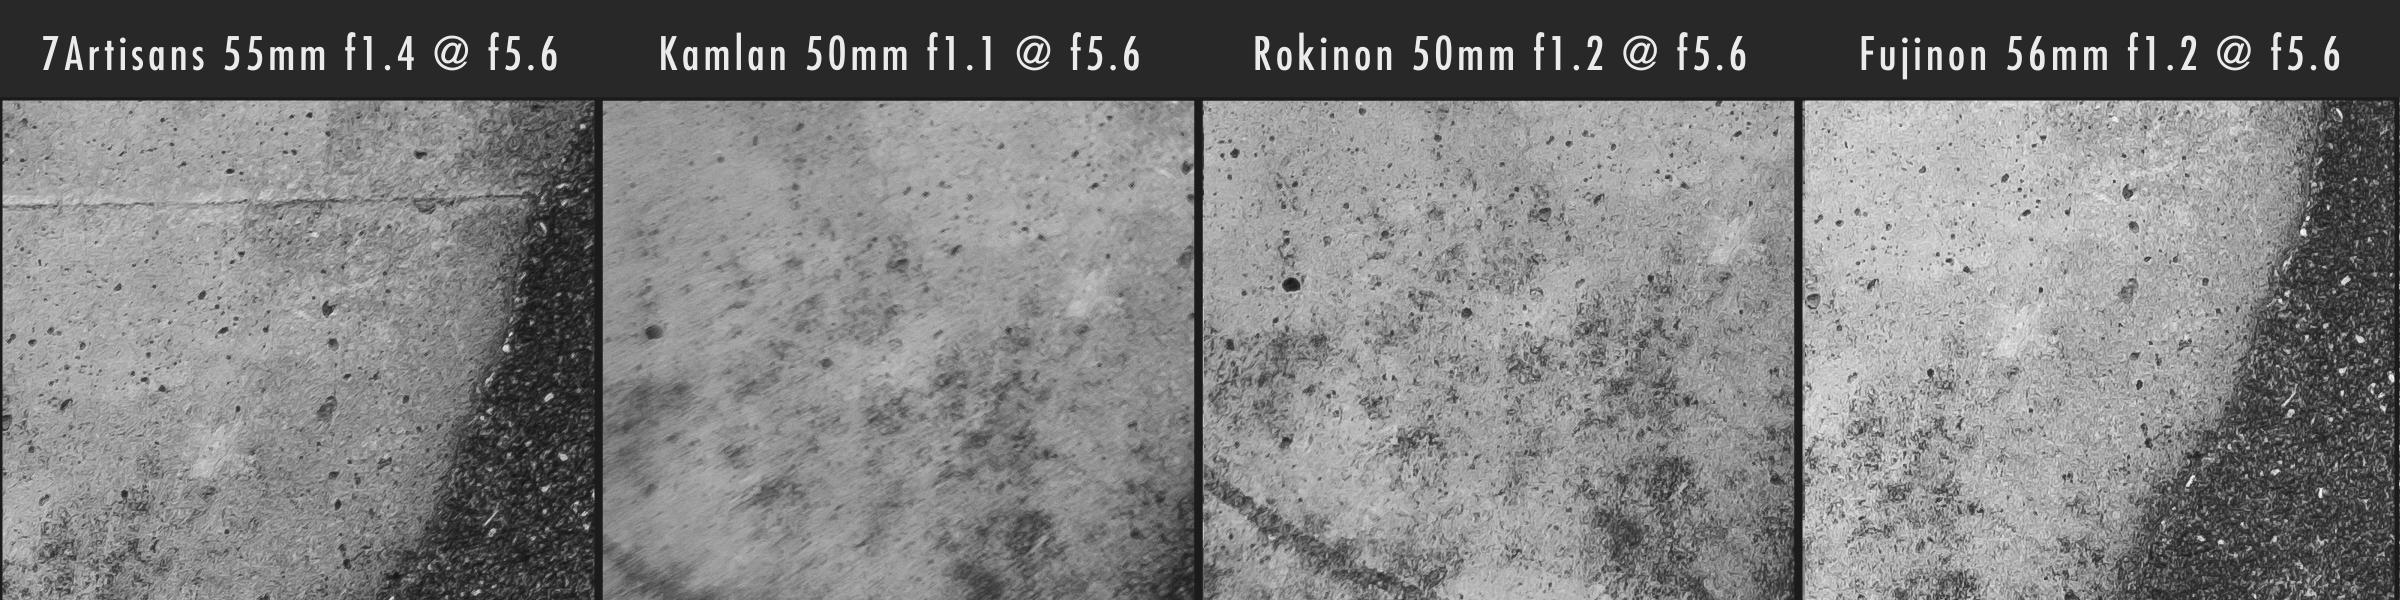 Kamlan 50mm f1.1 vs 7Artisans 55mm f1.4 vs Rokinon 50mm f1.2 Corner Sharpness @ f5.6